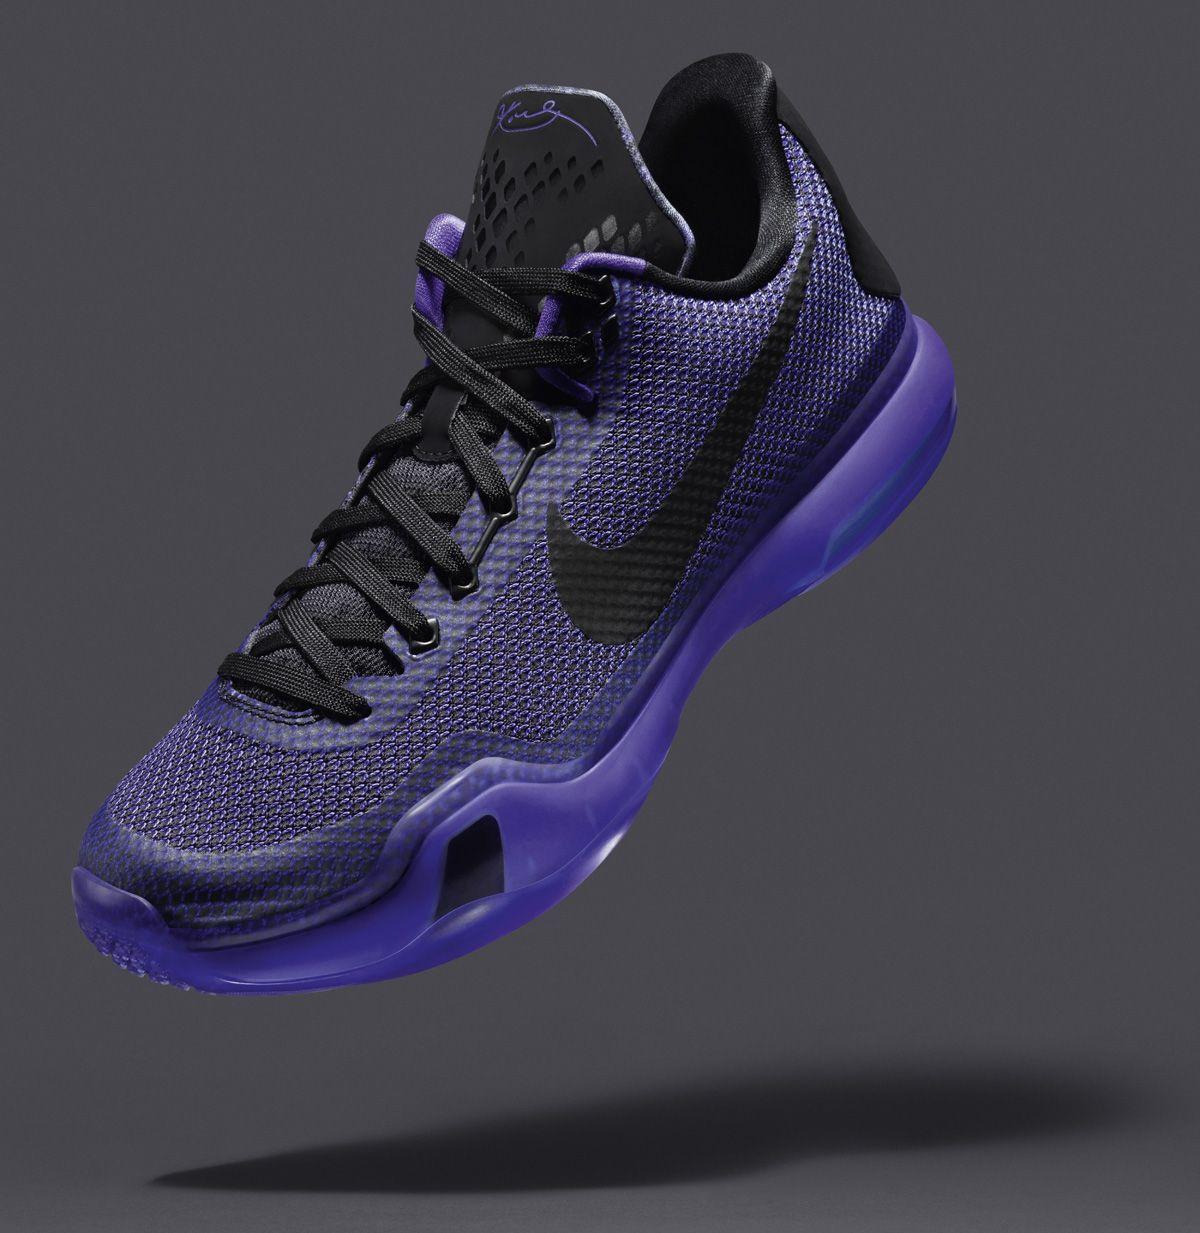 56a18f191259d Nike Kobe X